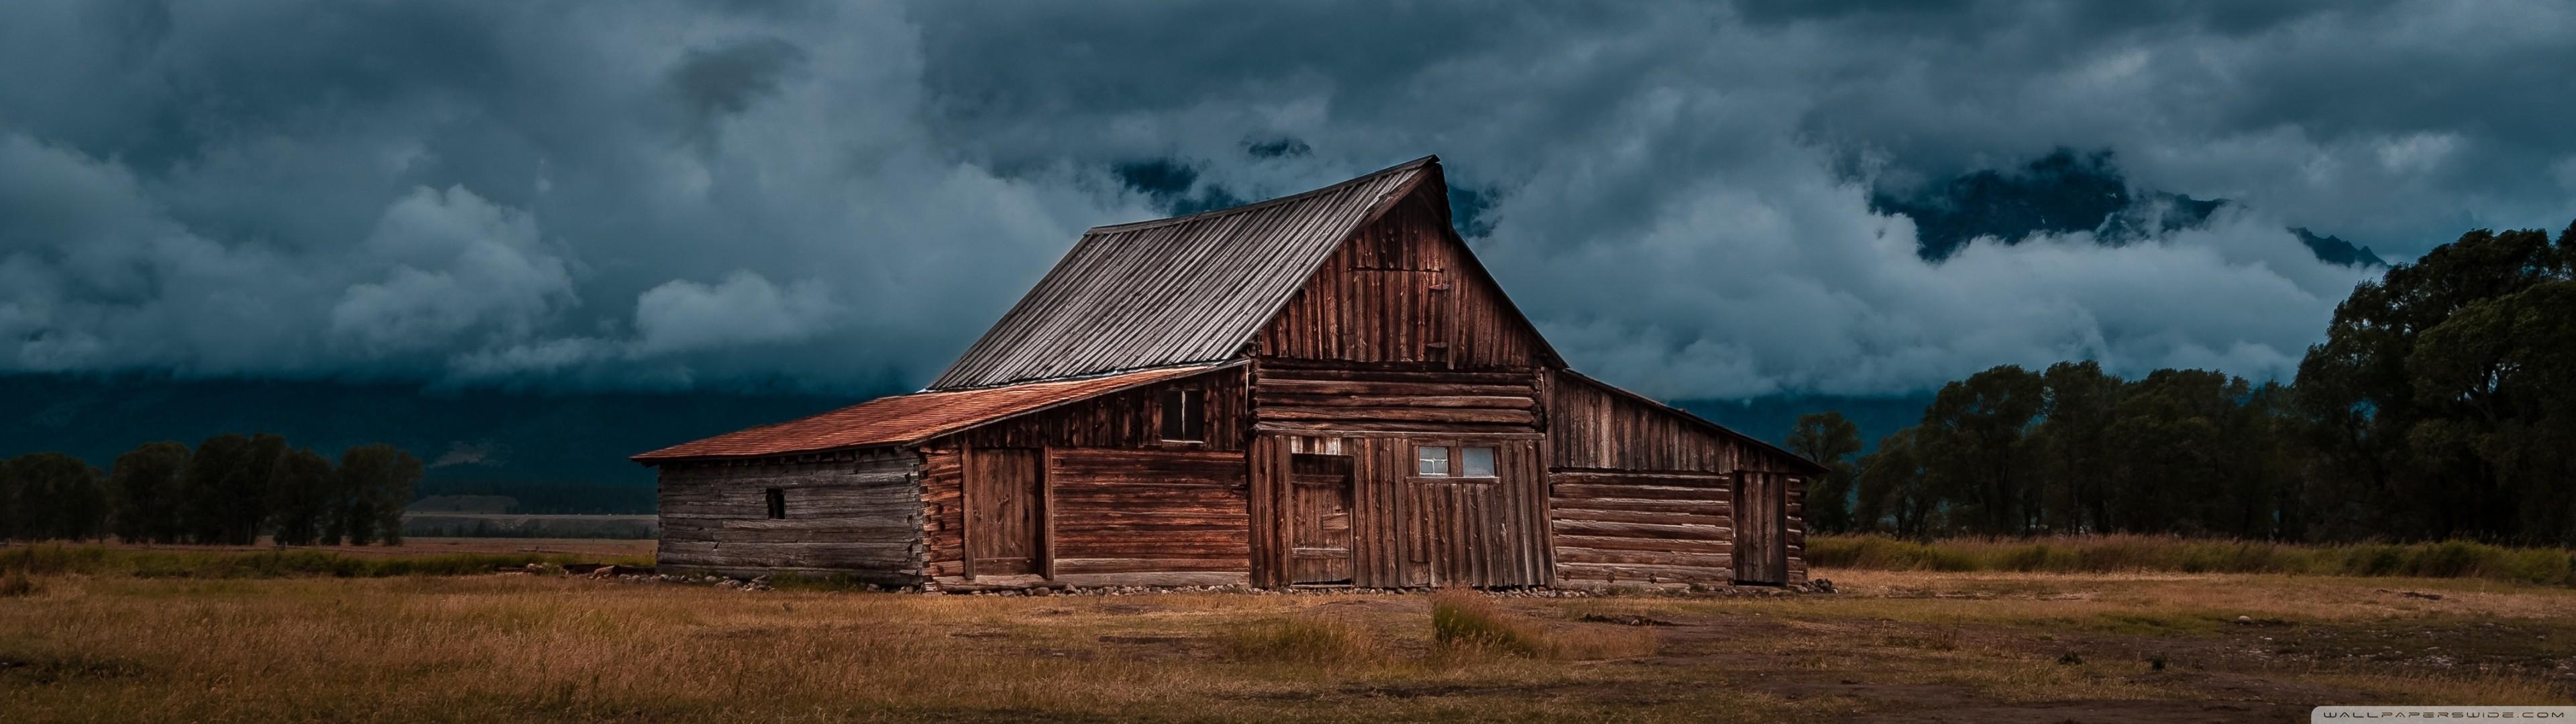 Abandoned Barn Dual Monitor Wallpaper 3840×1080